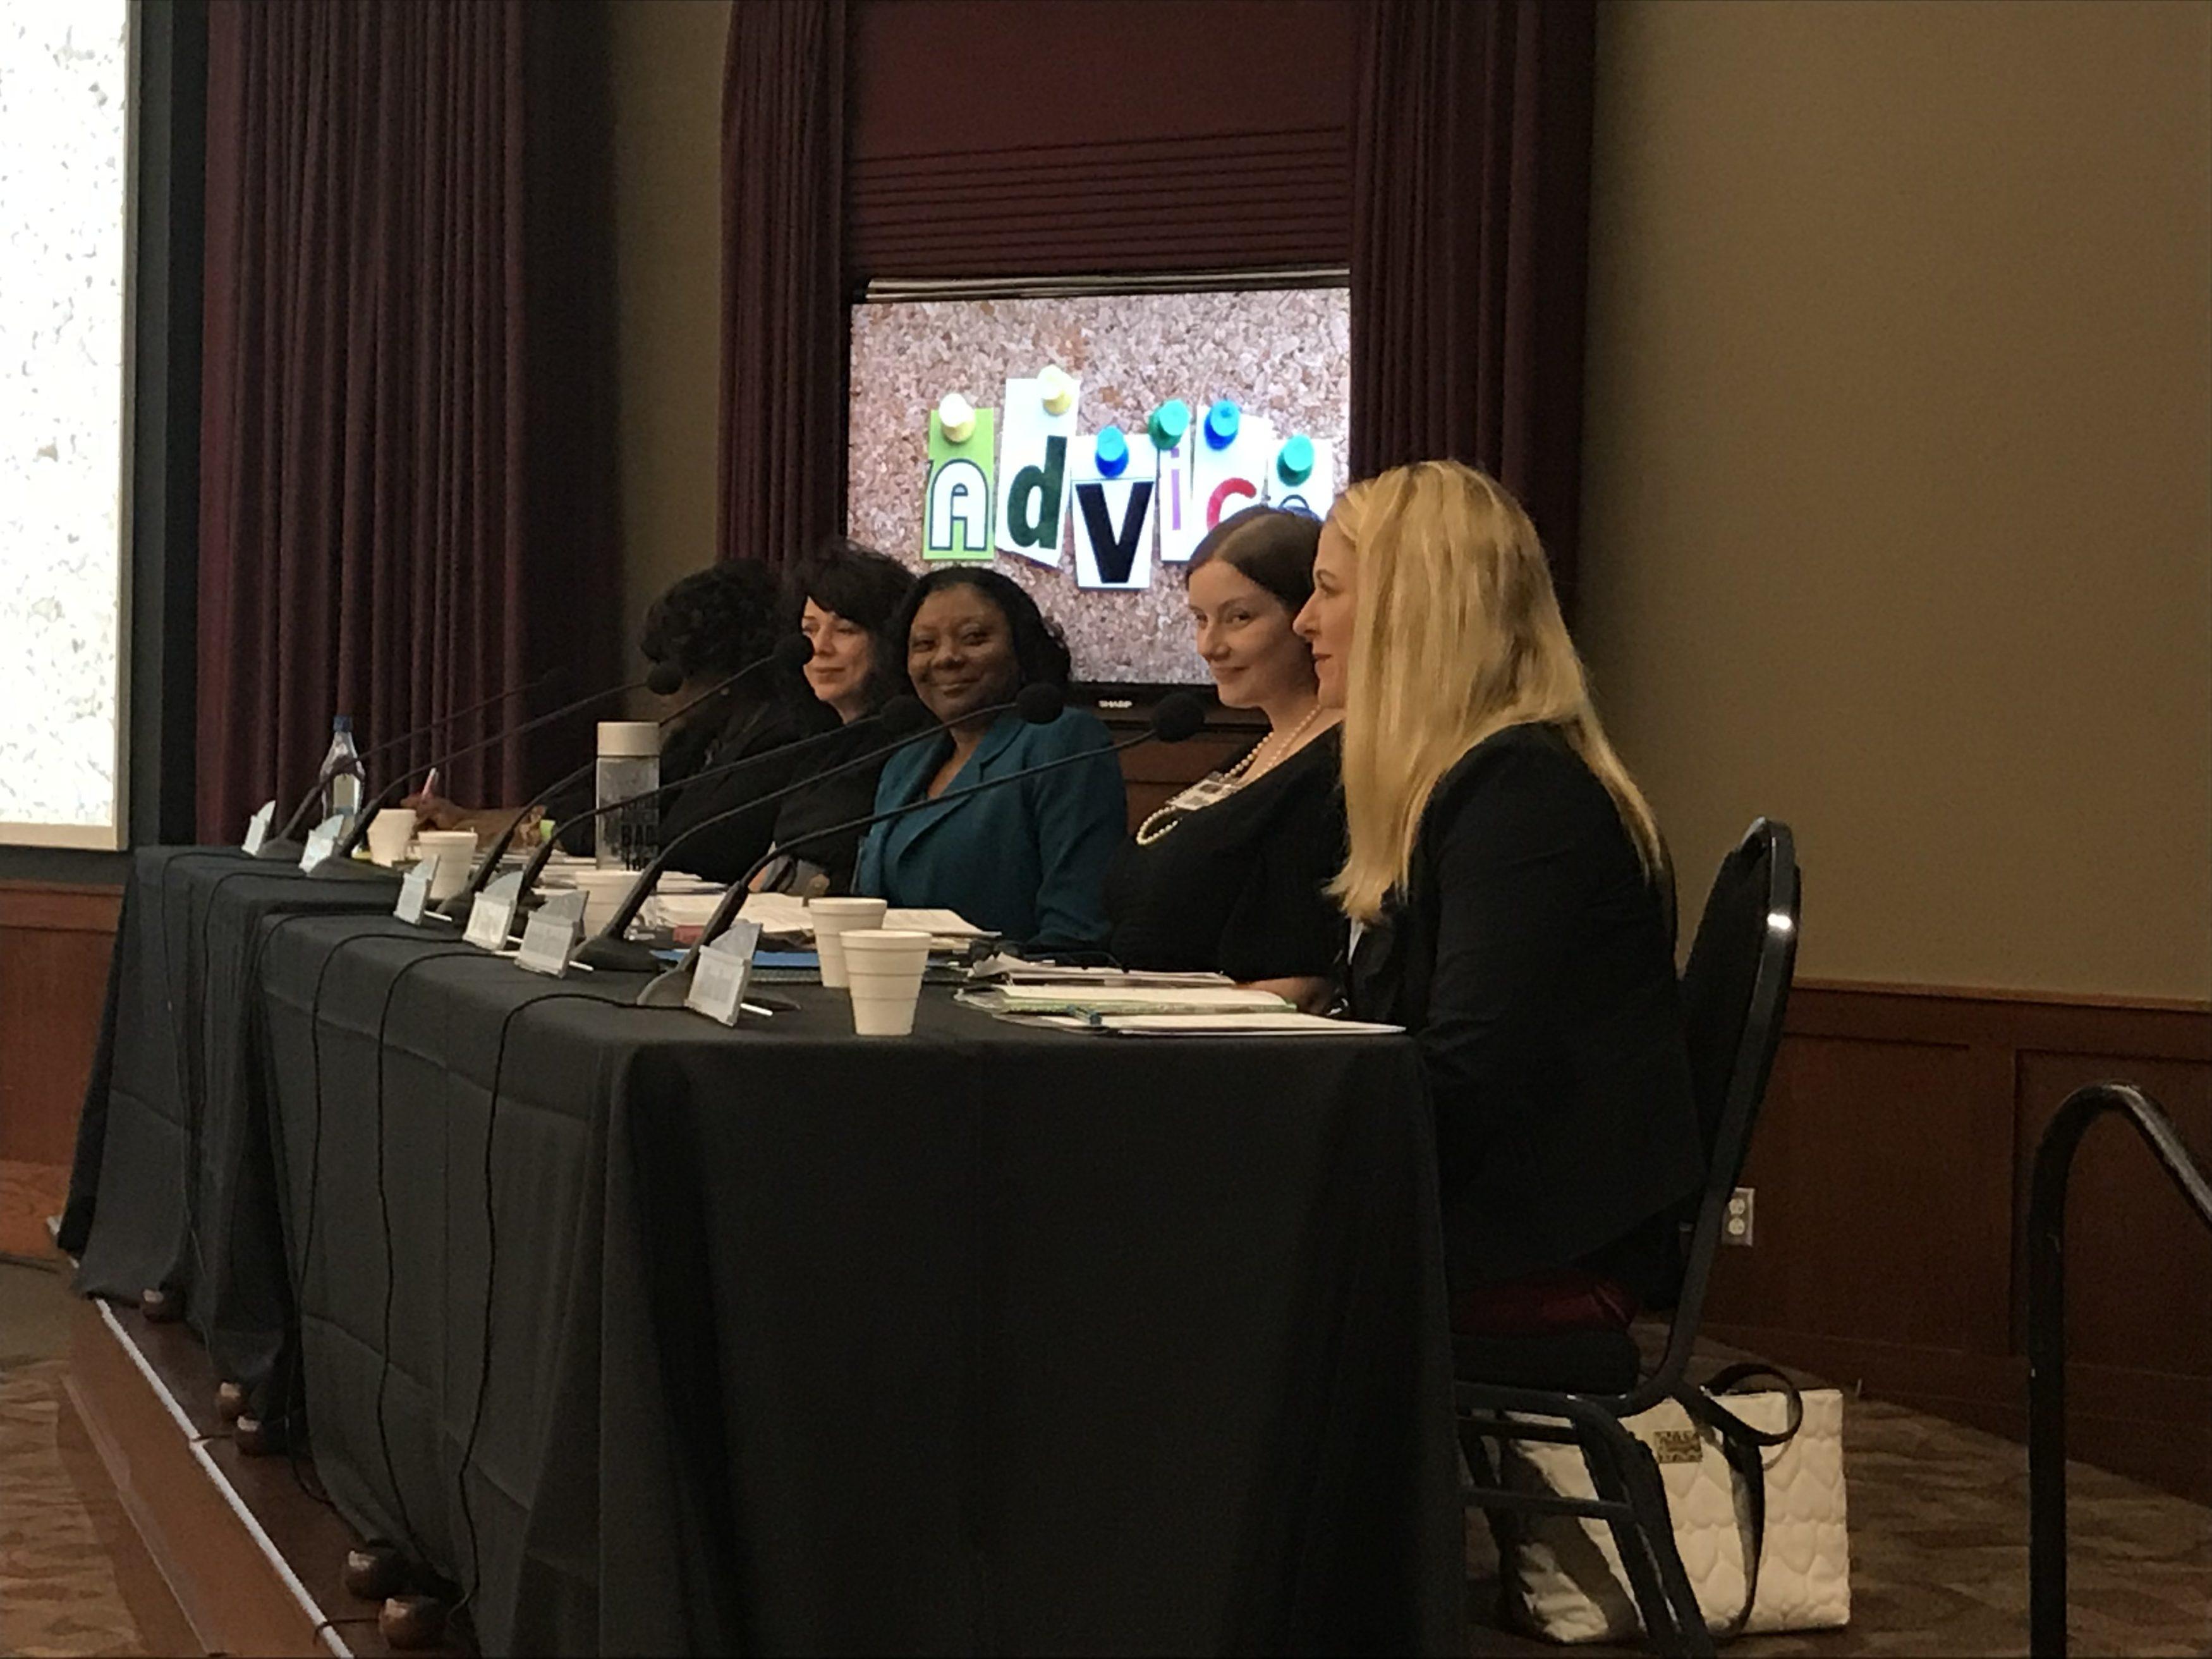 Women in Business panel